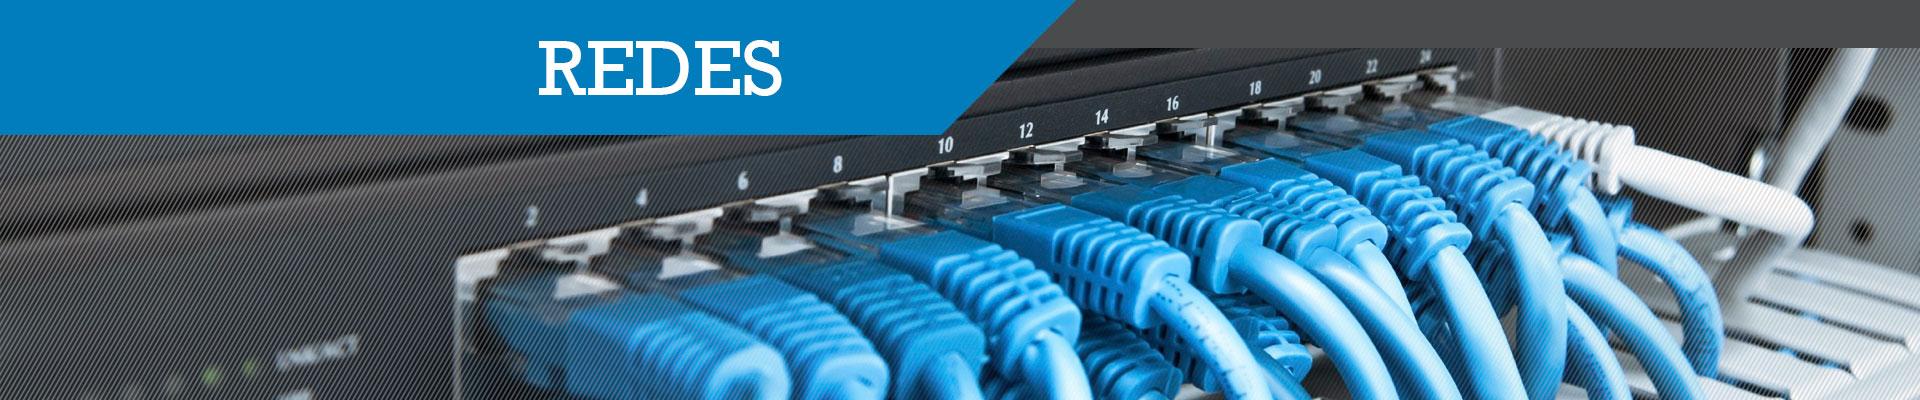 Redes - Global Informática